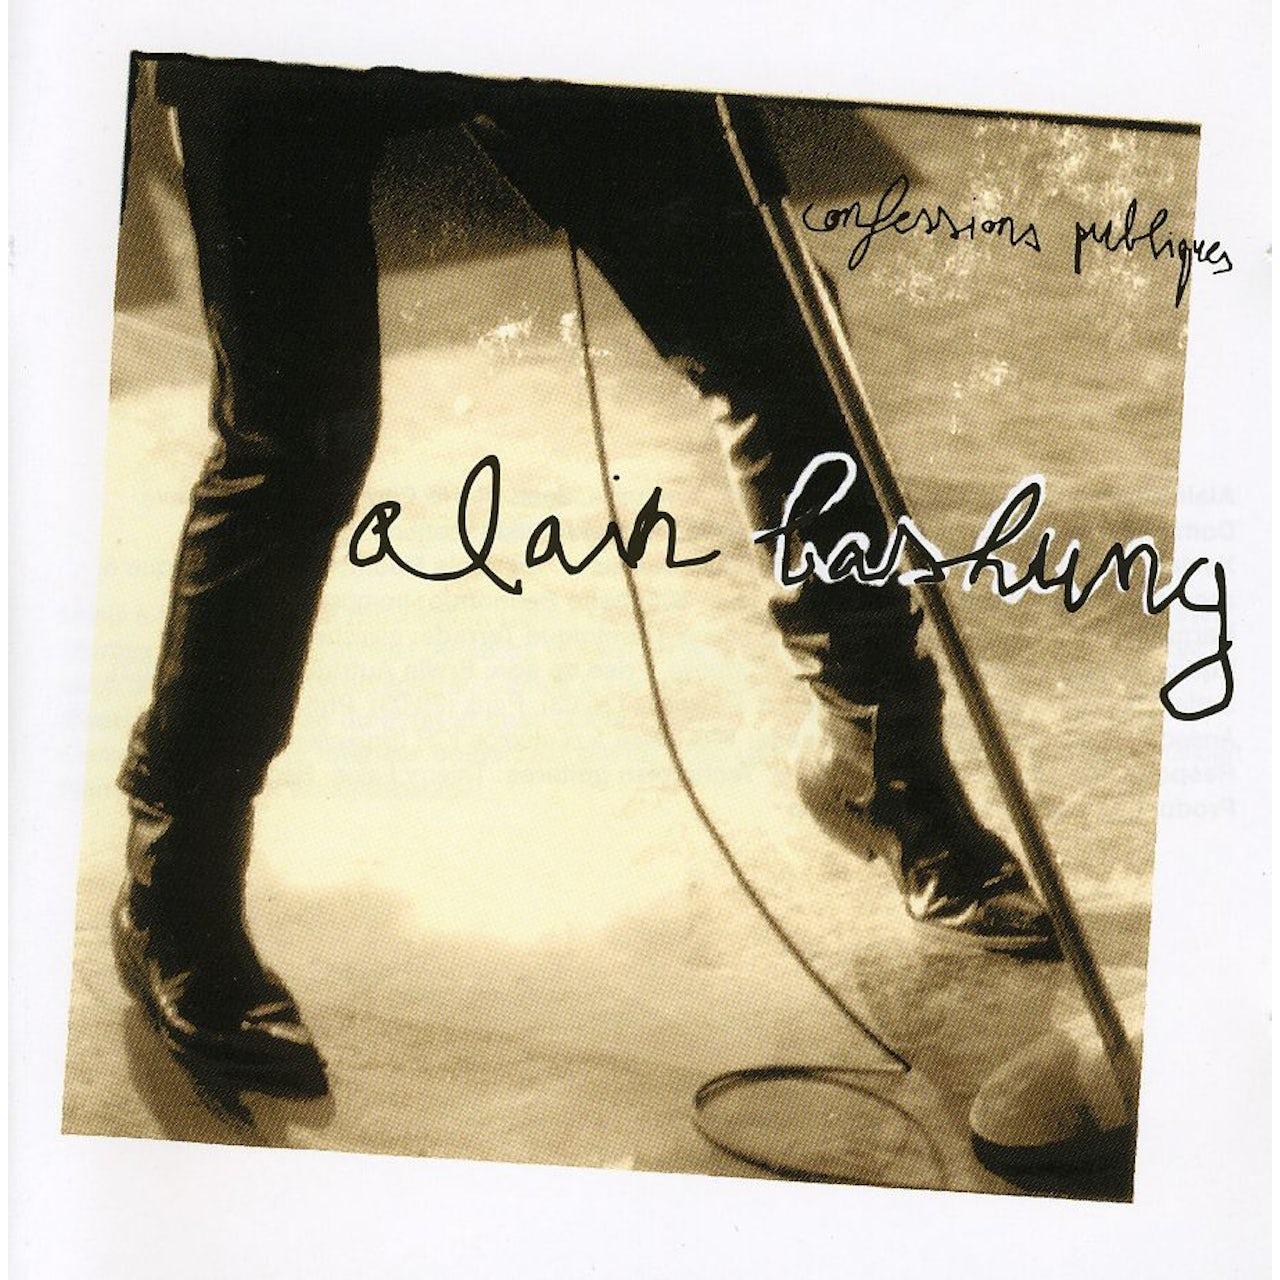 Alain Bashung CONFESSIONS PUBLIQUES CD